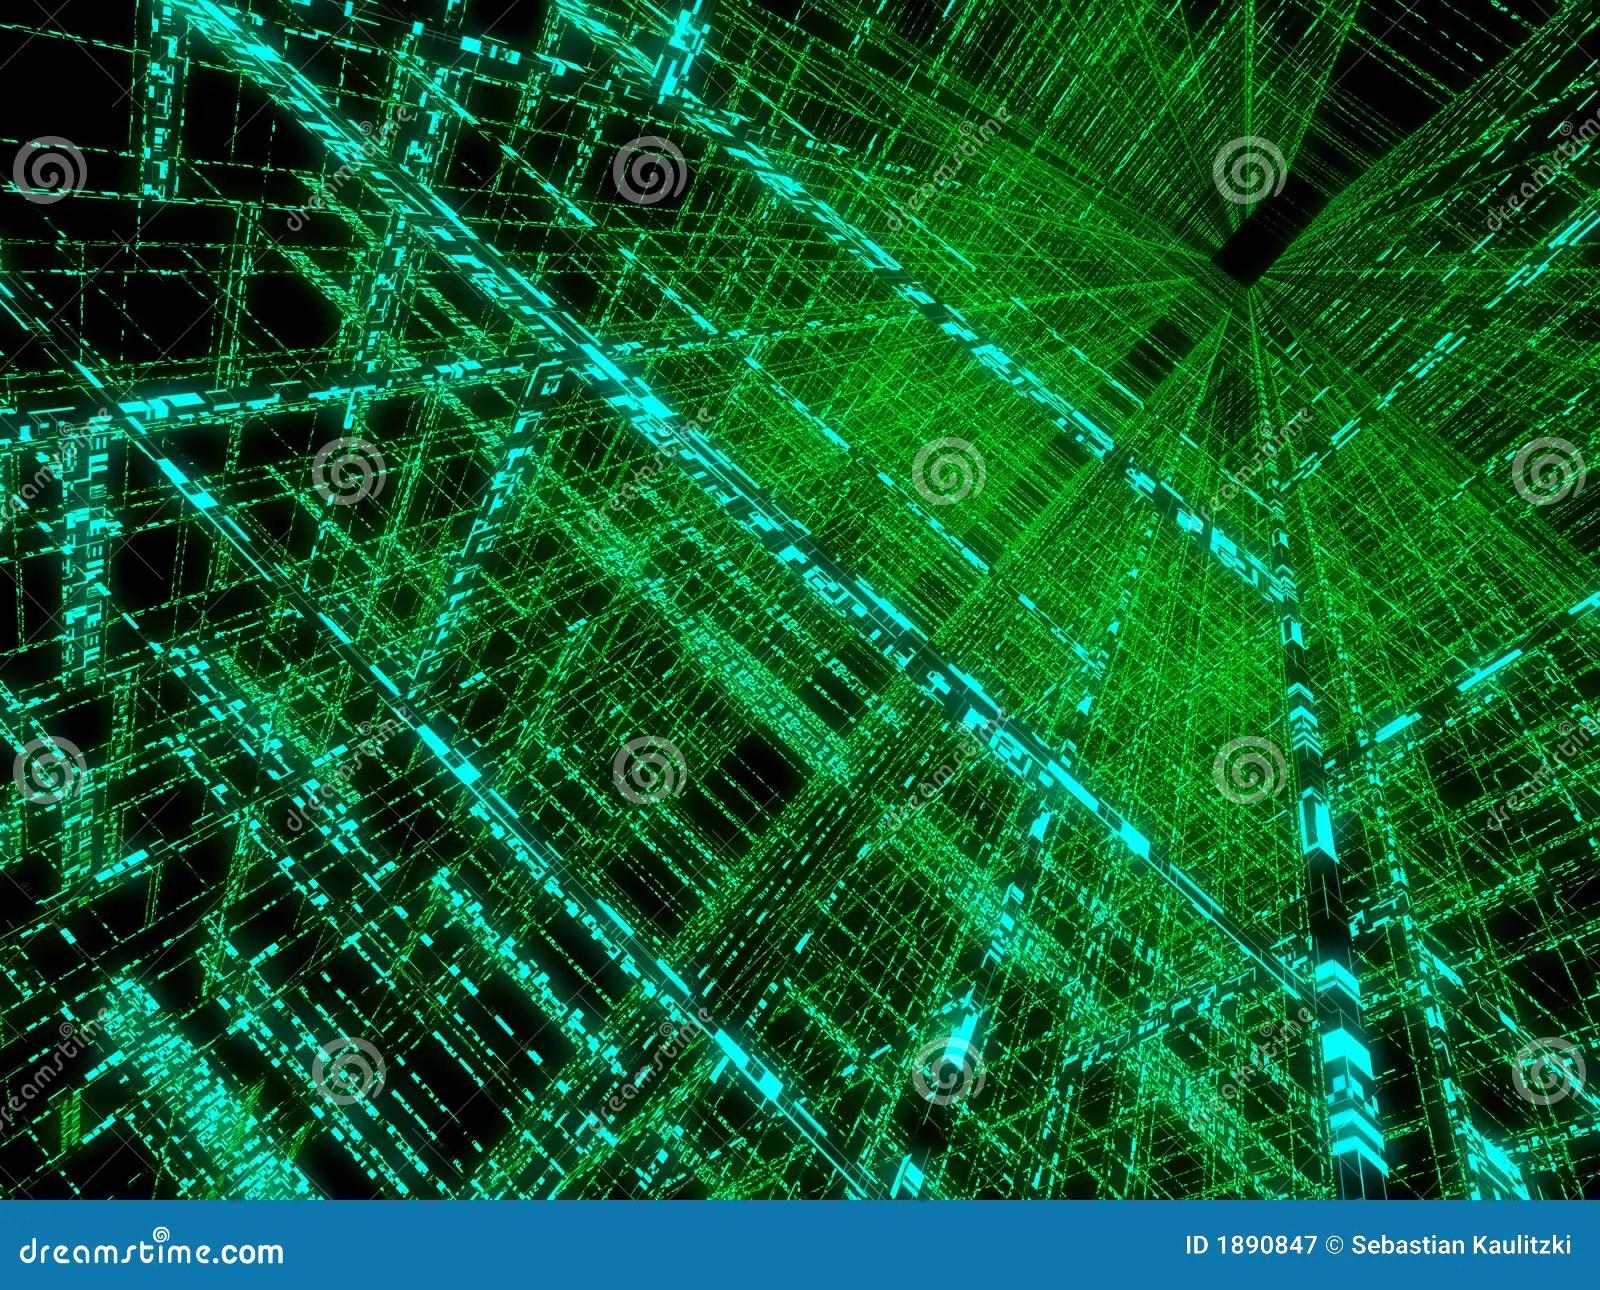 3d Wallpaper Hd Universe Green Matrix Royalty Free Stock Photography Image 1890847